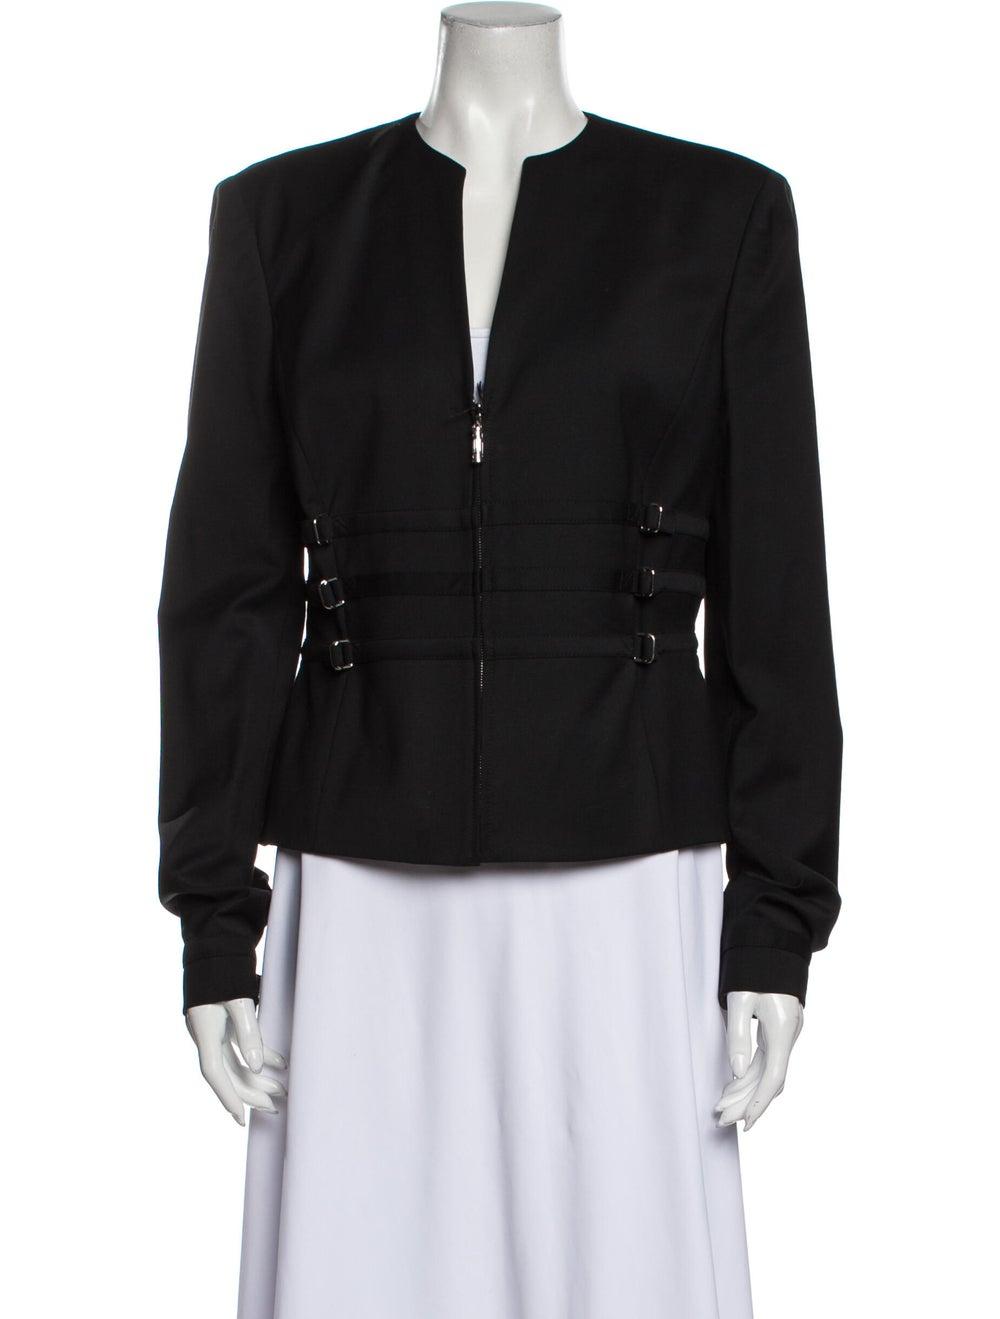 Gianni Versace Vintage Jacket Black - image 1